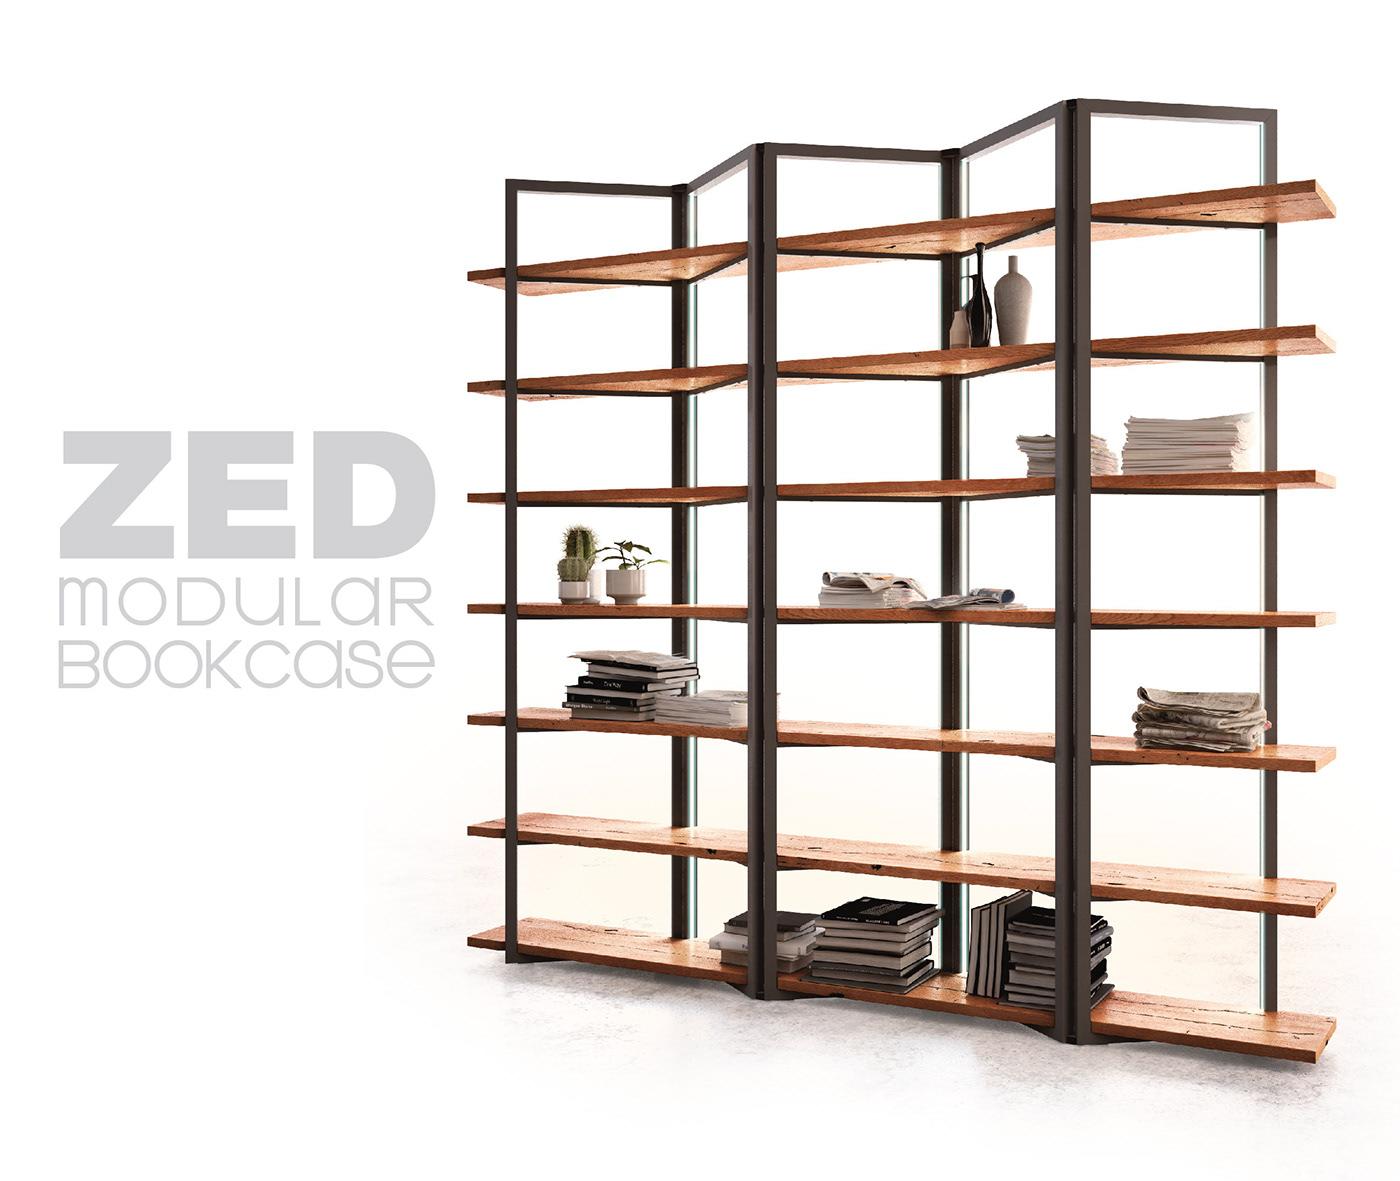 Zed Modular Bookcase On Behance